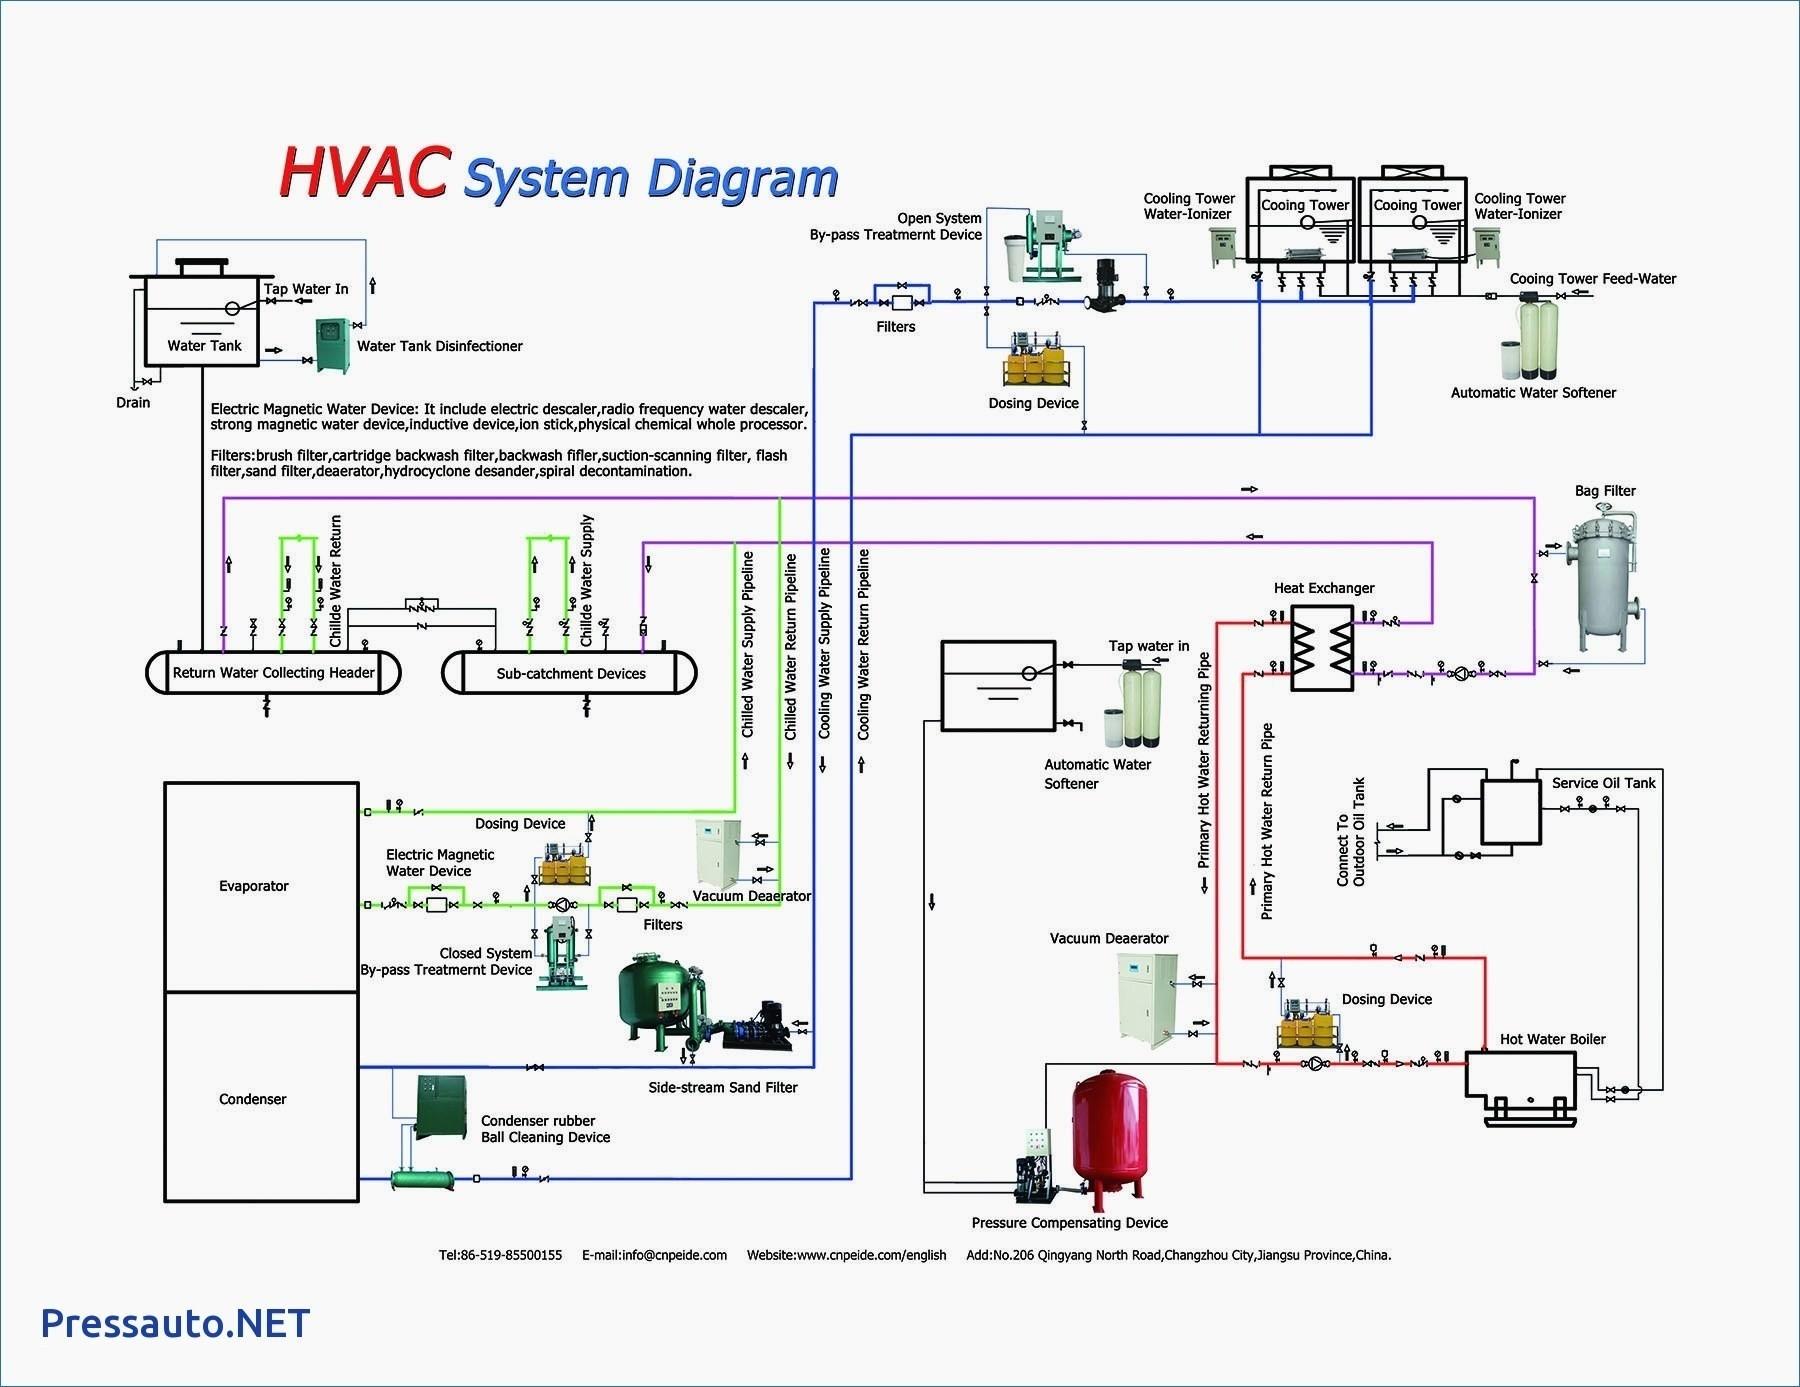 hight resolution of furnace fan motor wiring diagram wiring diagram boiler system simple furnace blower motor wiring diagram